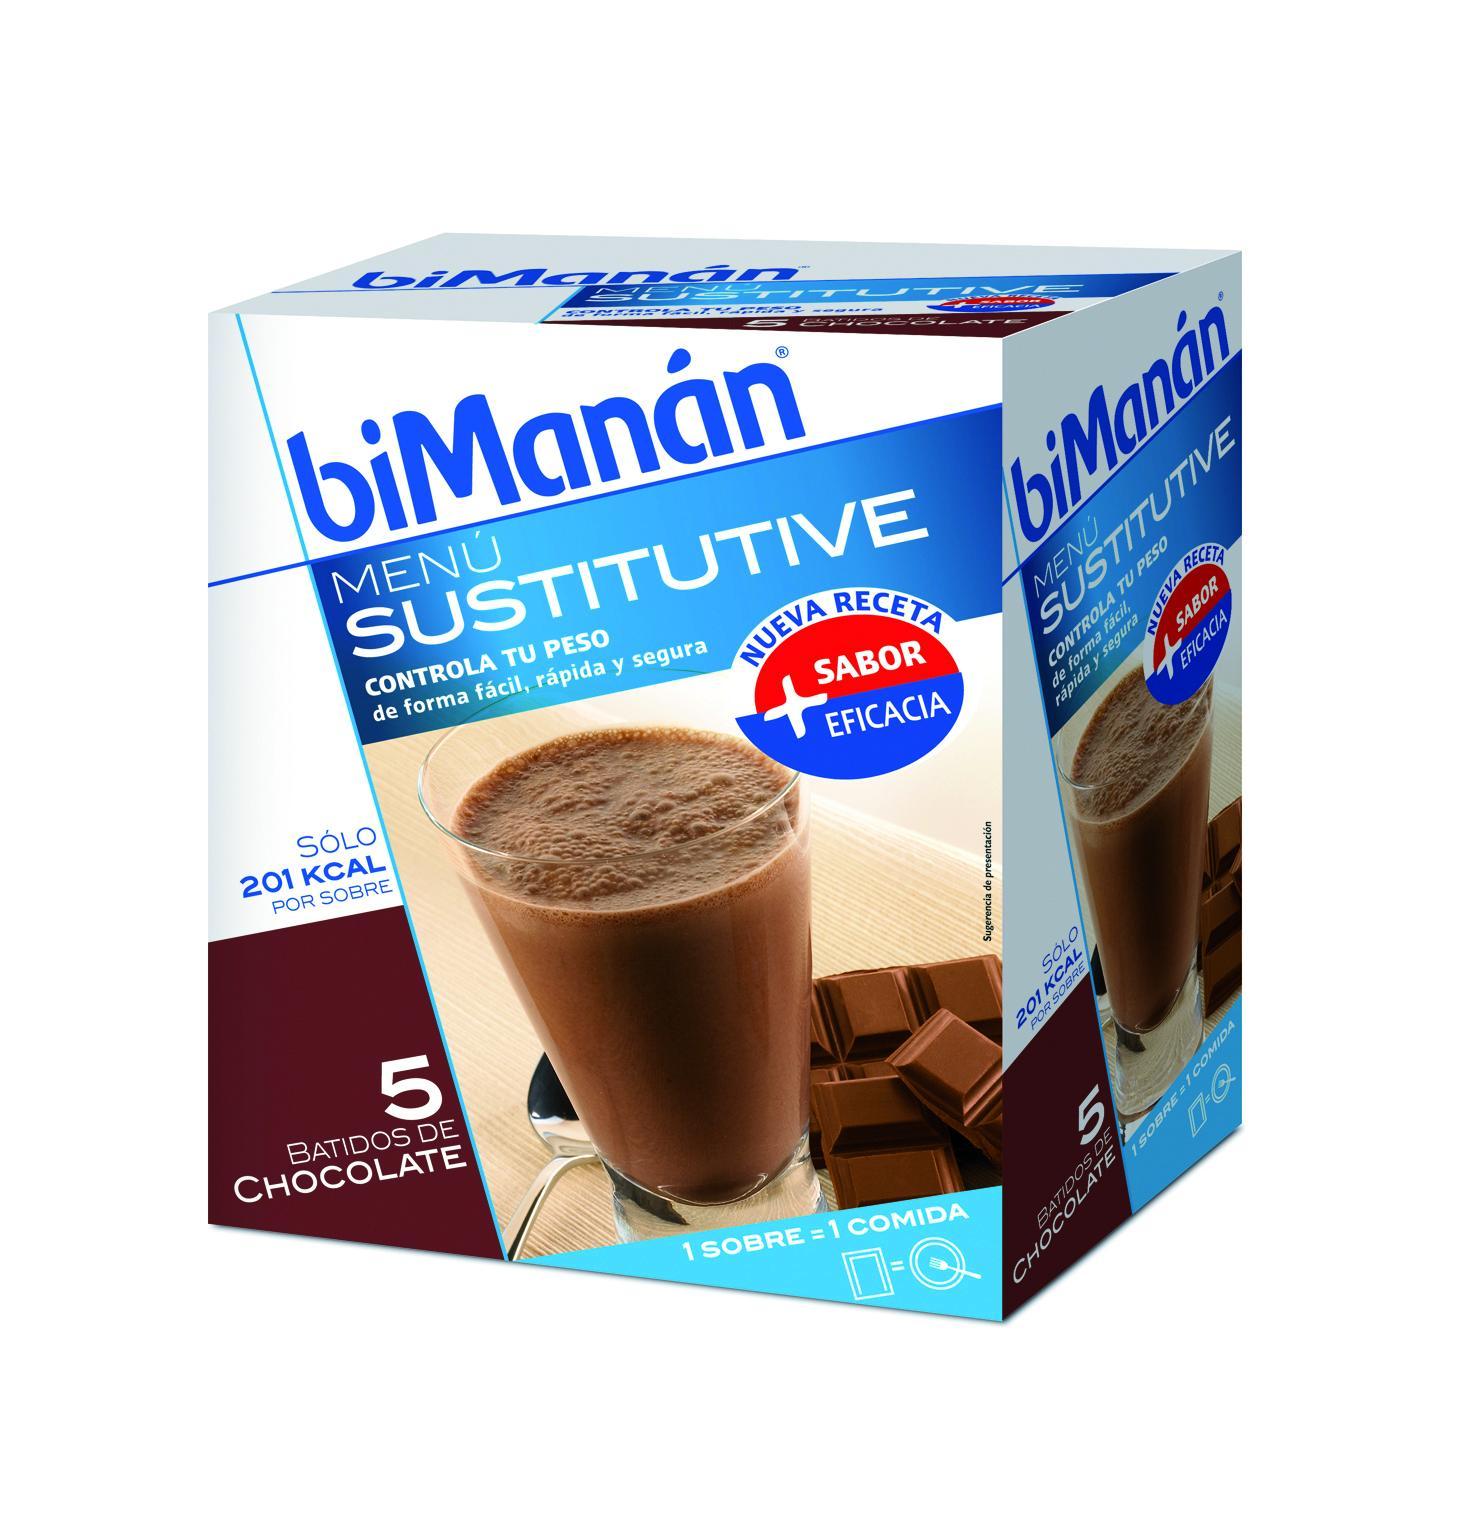 Bimanan Batido de chocolate 5 sobres